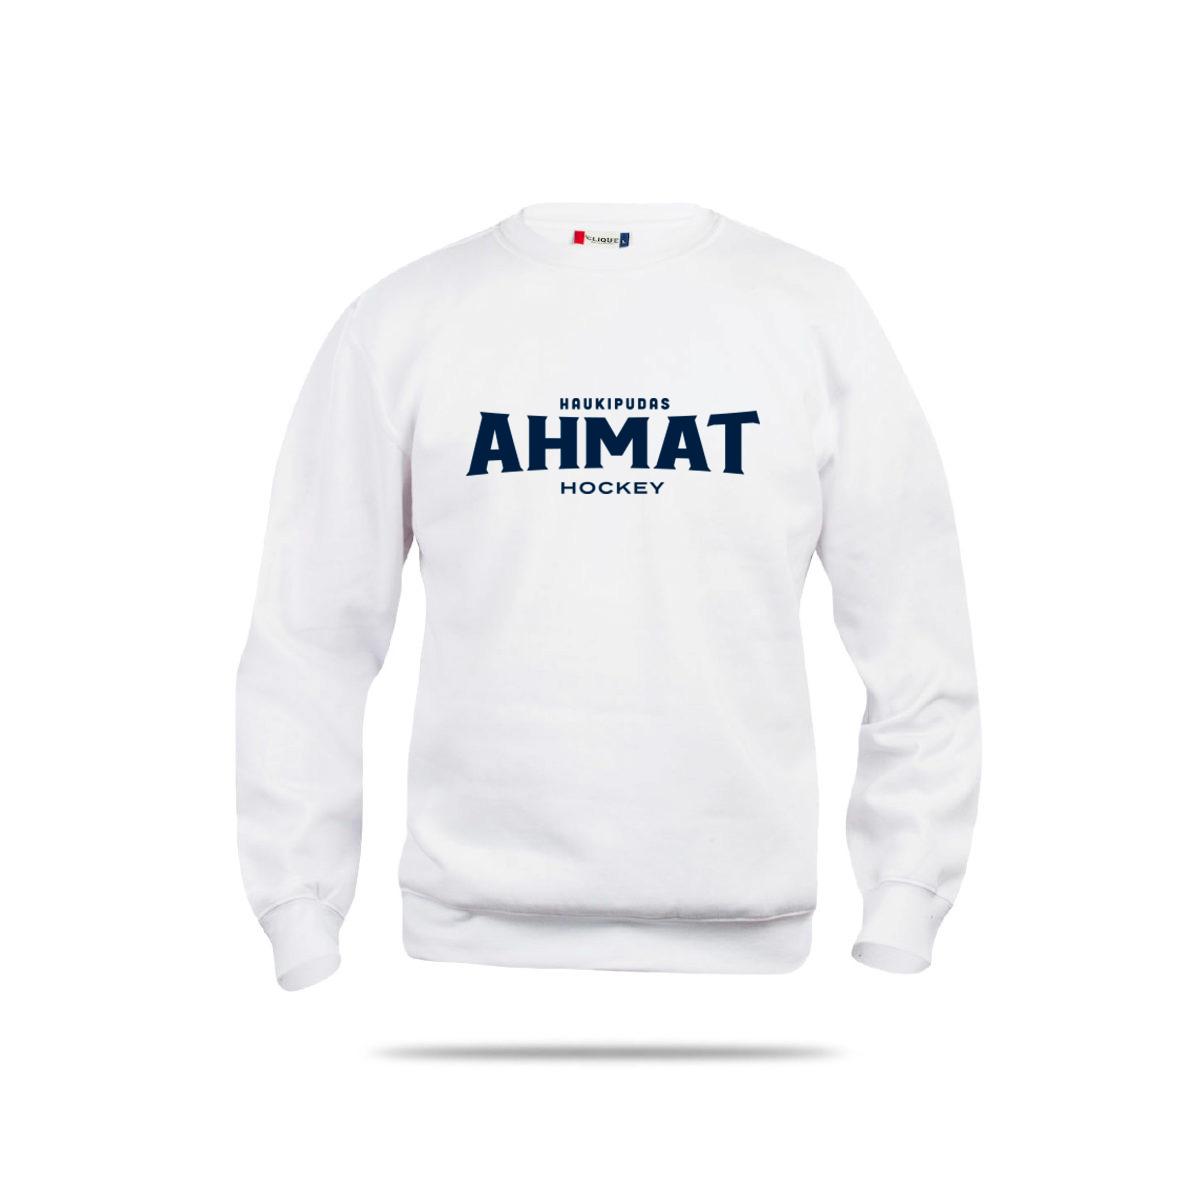 Ahmat-fani-3023-valk-text